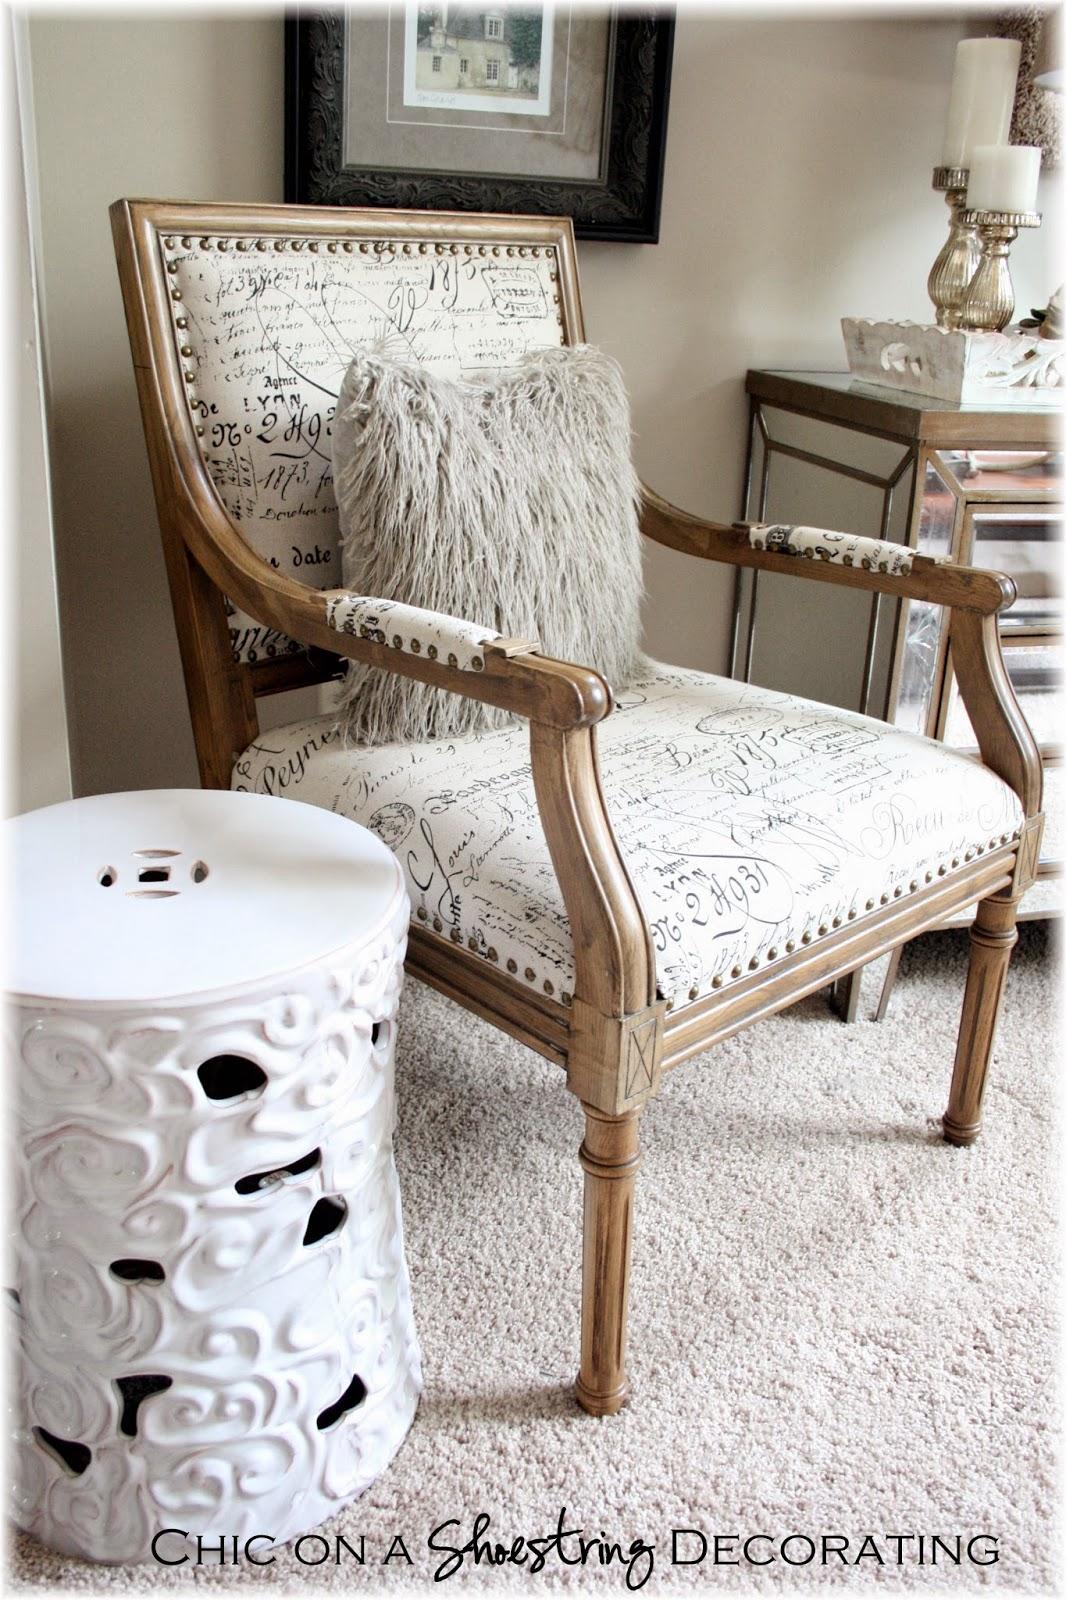 Chic On A Shoestring Decorating Blog Marais Arm Chair Document Script Fabric